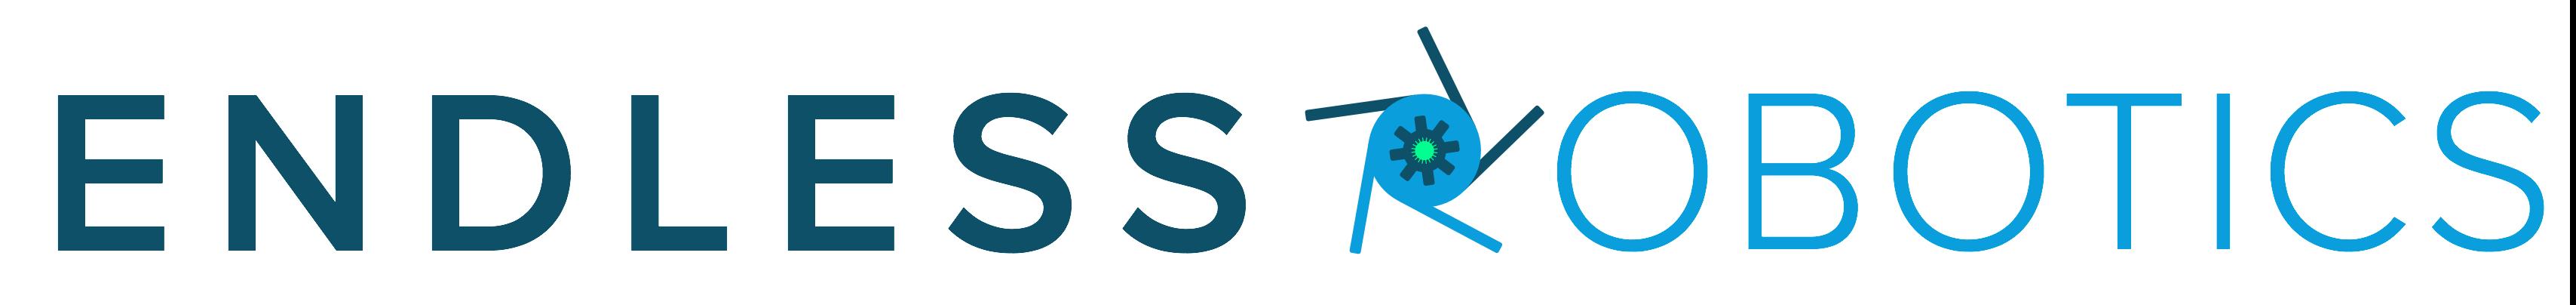 Endless Robotics company logo